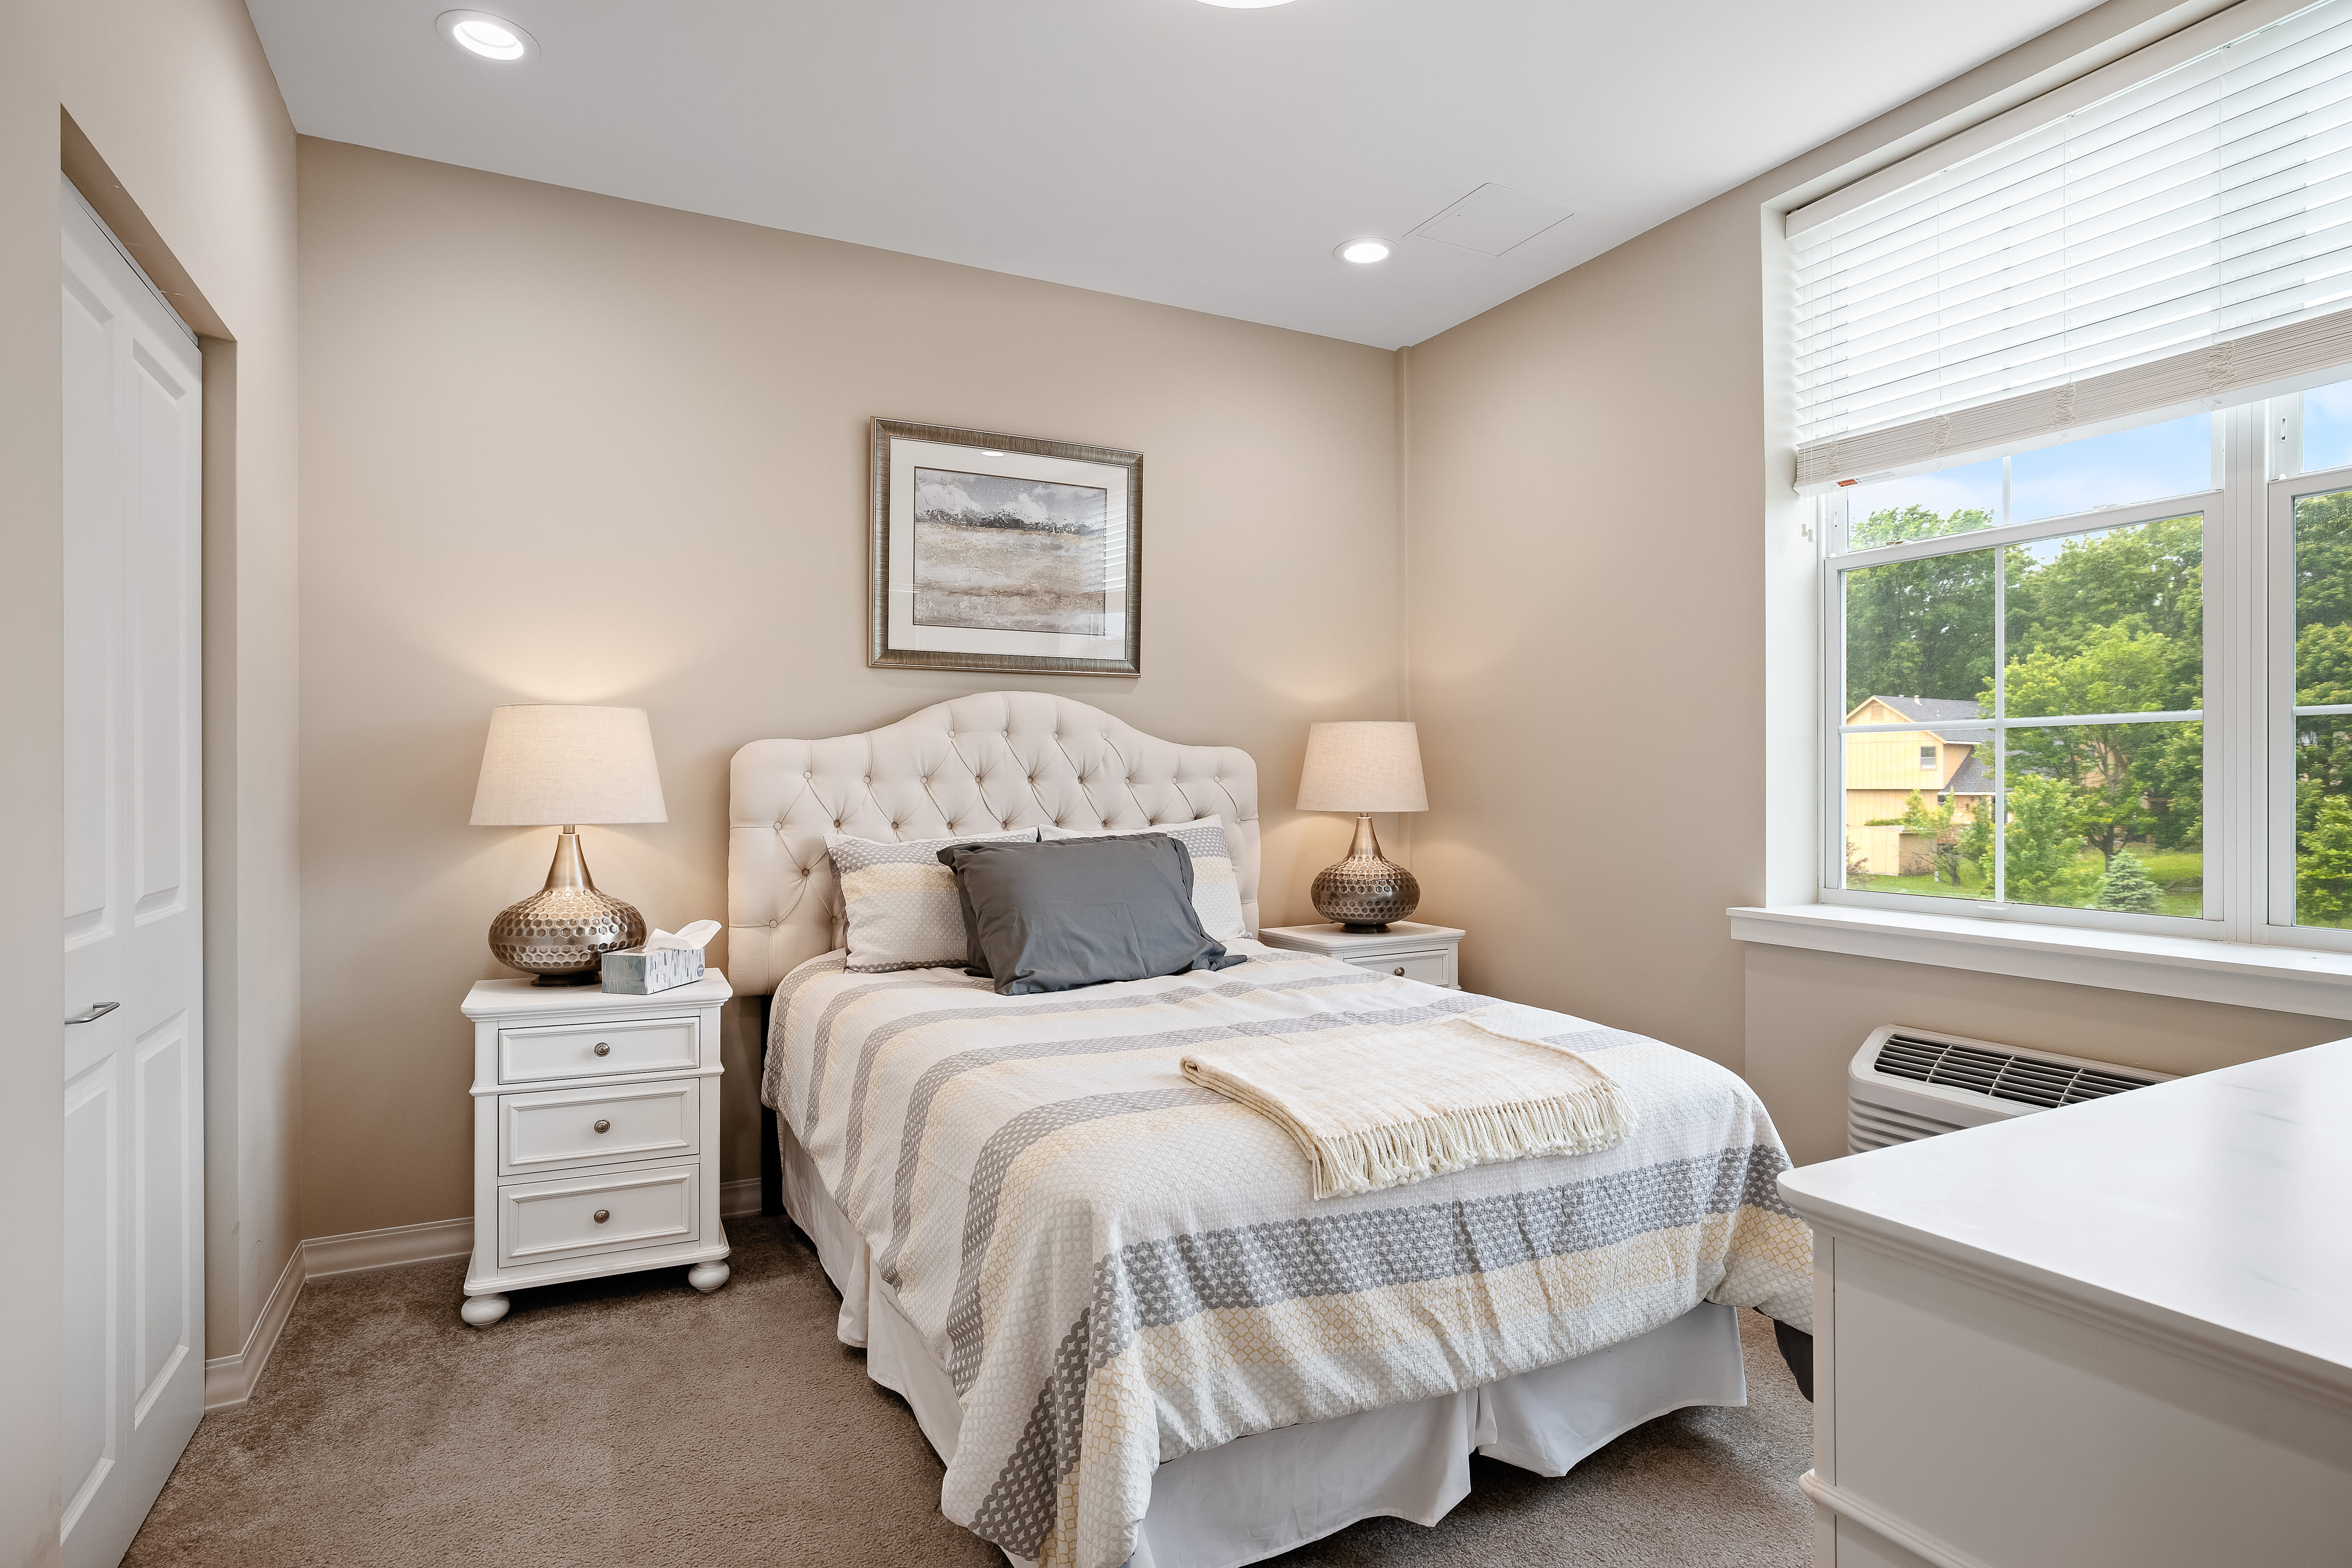 A resident bedroom at Anthology of Overland Park in Overland Park, Kansas.